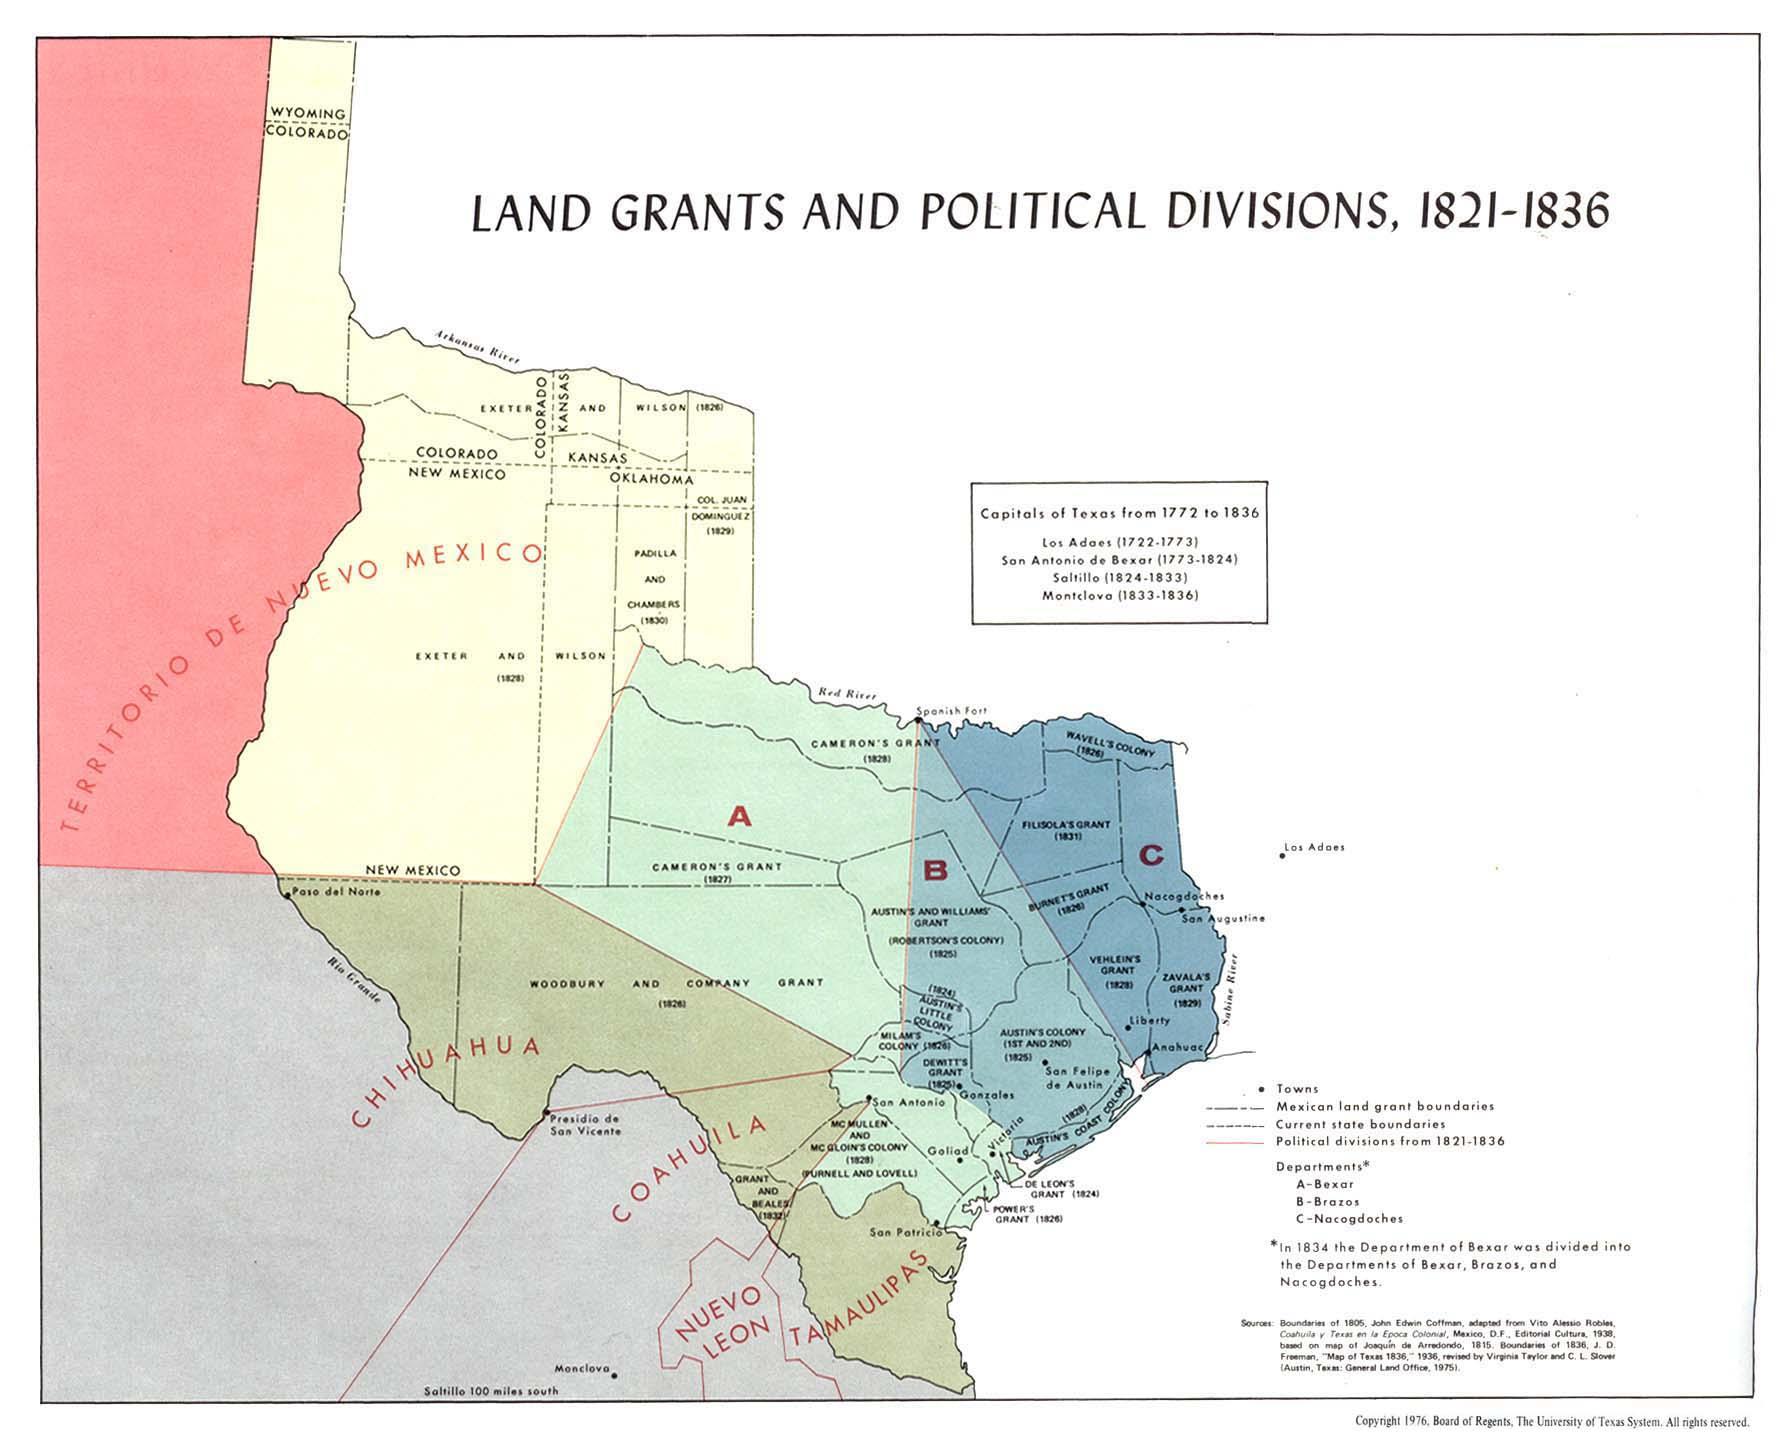 Texas Historical Maps - Perry-Castañeda Map Collection - Ut Library - San Antonio Texas Maps